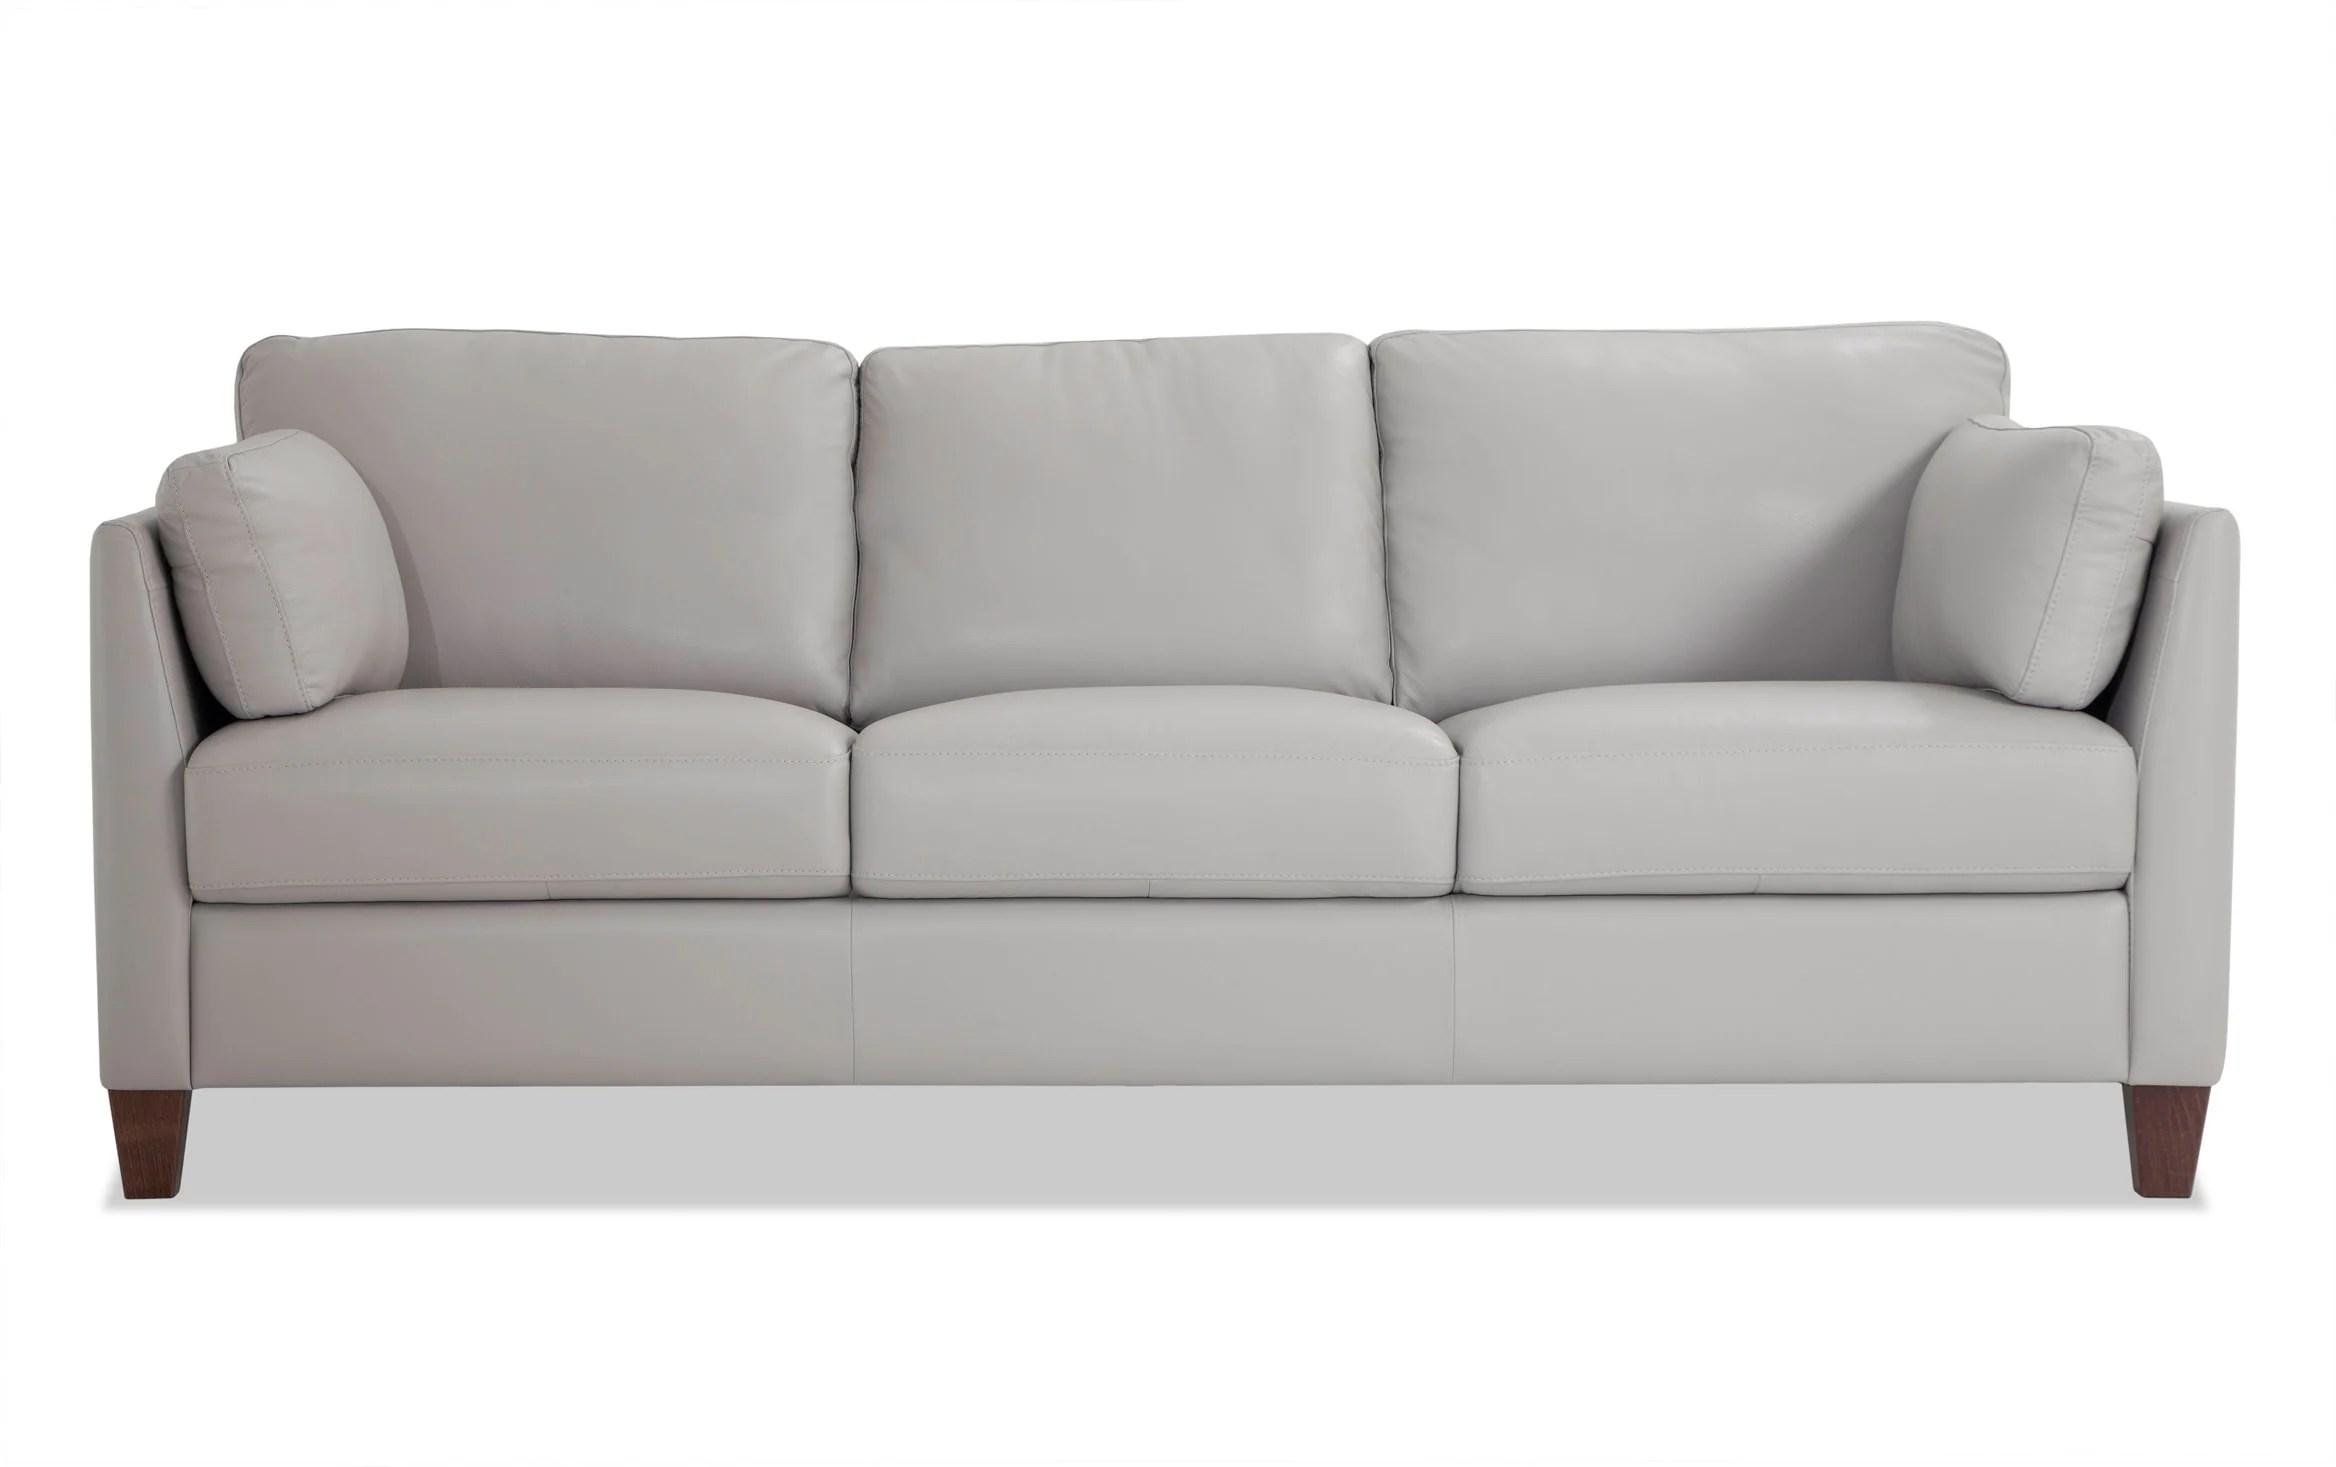 antonio light gray leather sofa